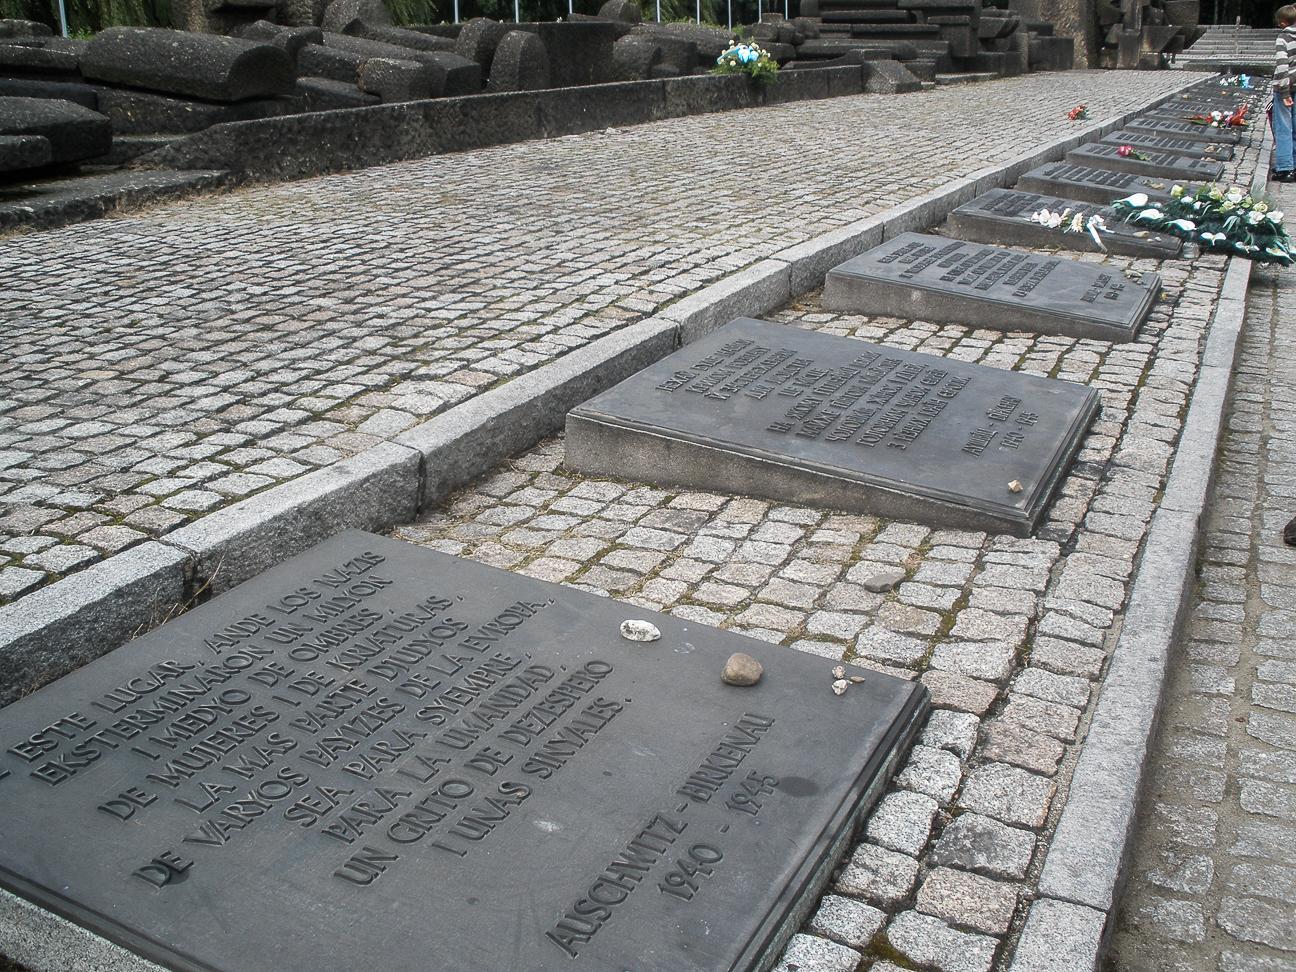 Placa conmemorativa en Auschwitz